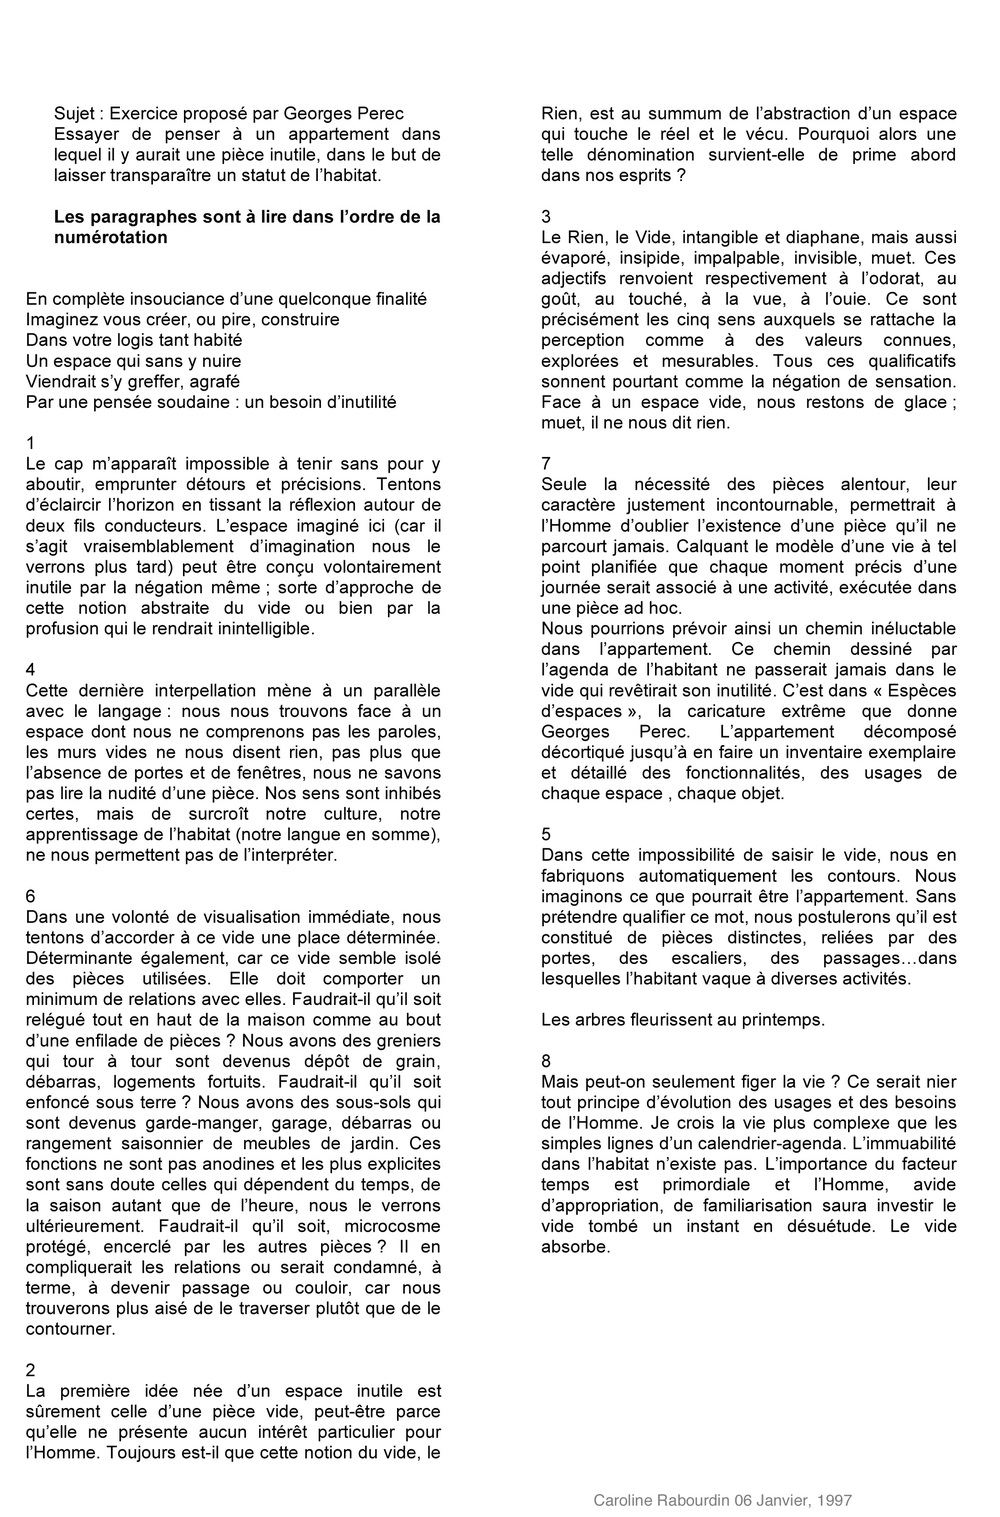 1997_caroline rabourdin_perec-1.jpg